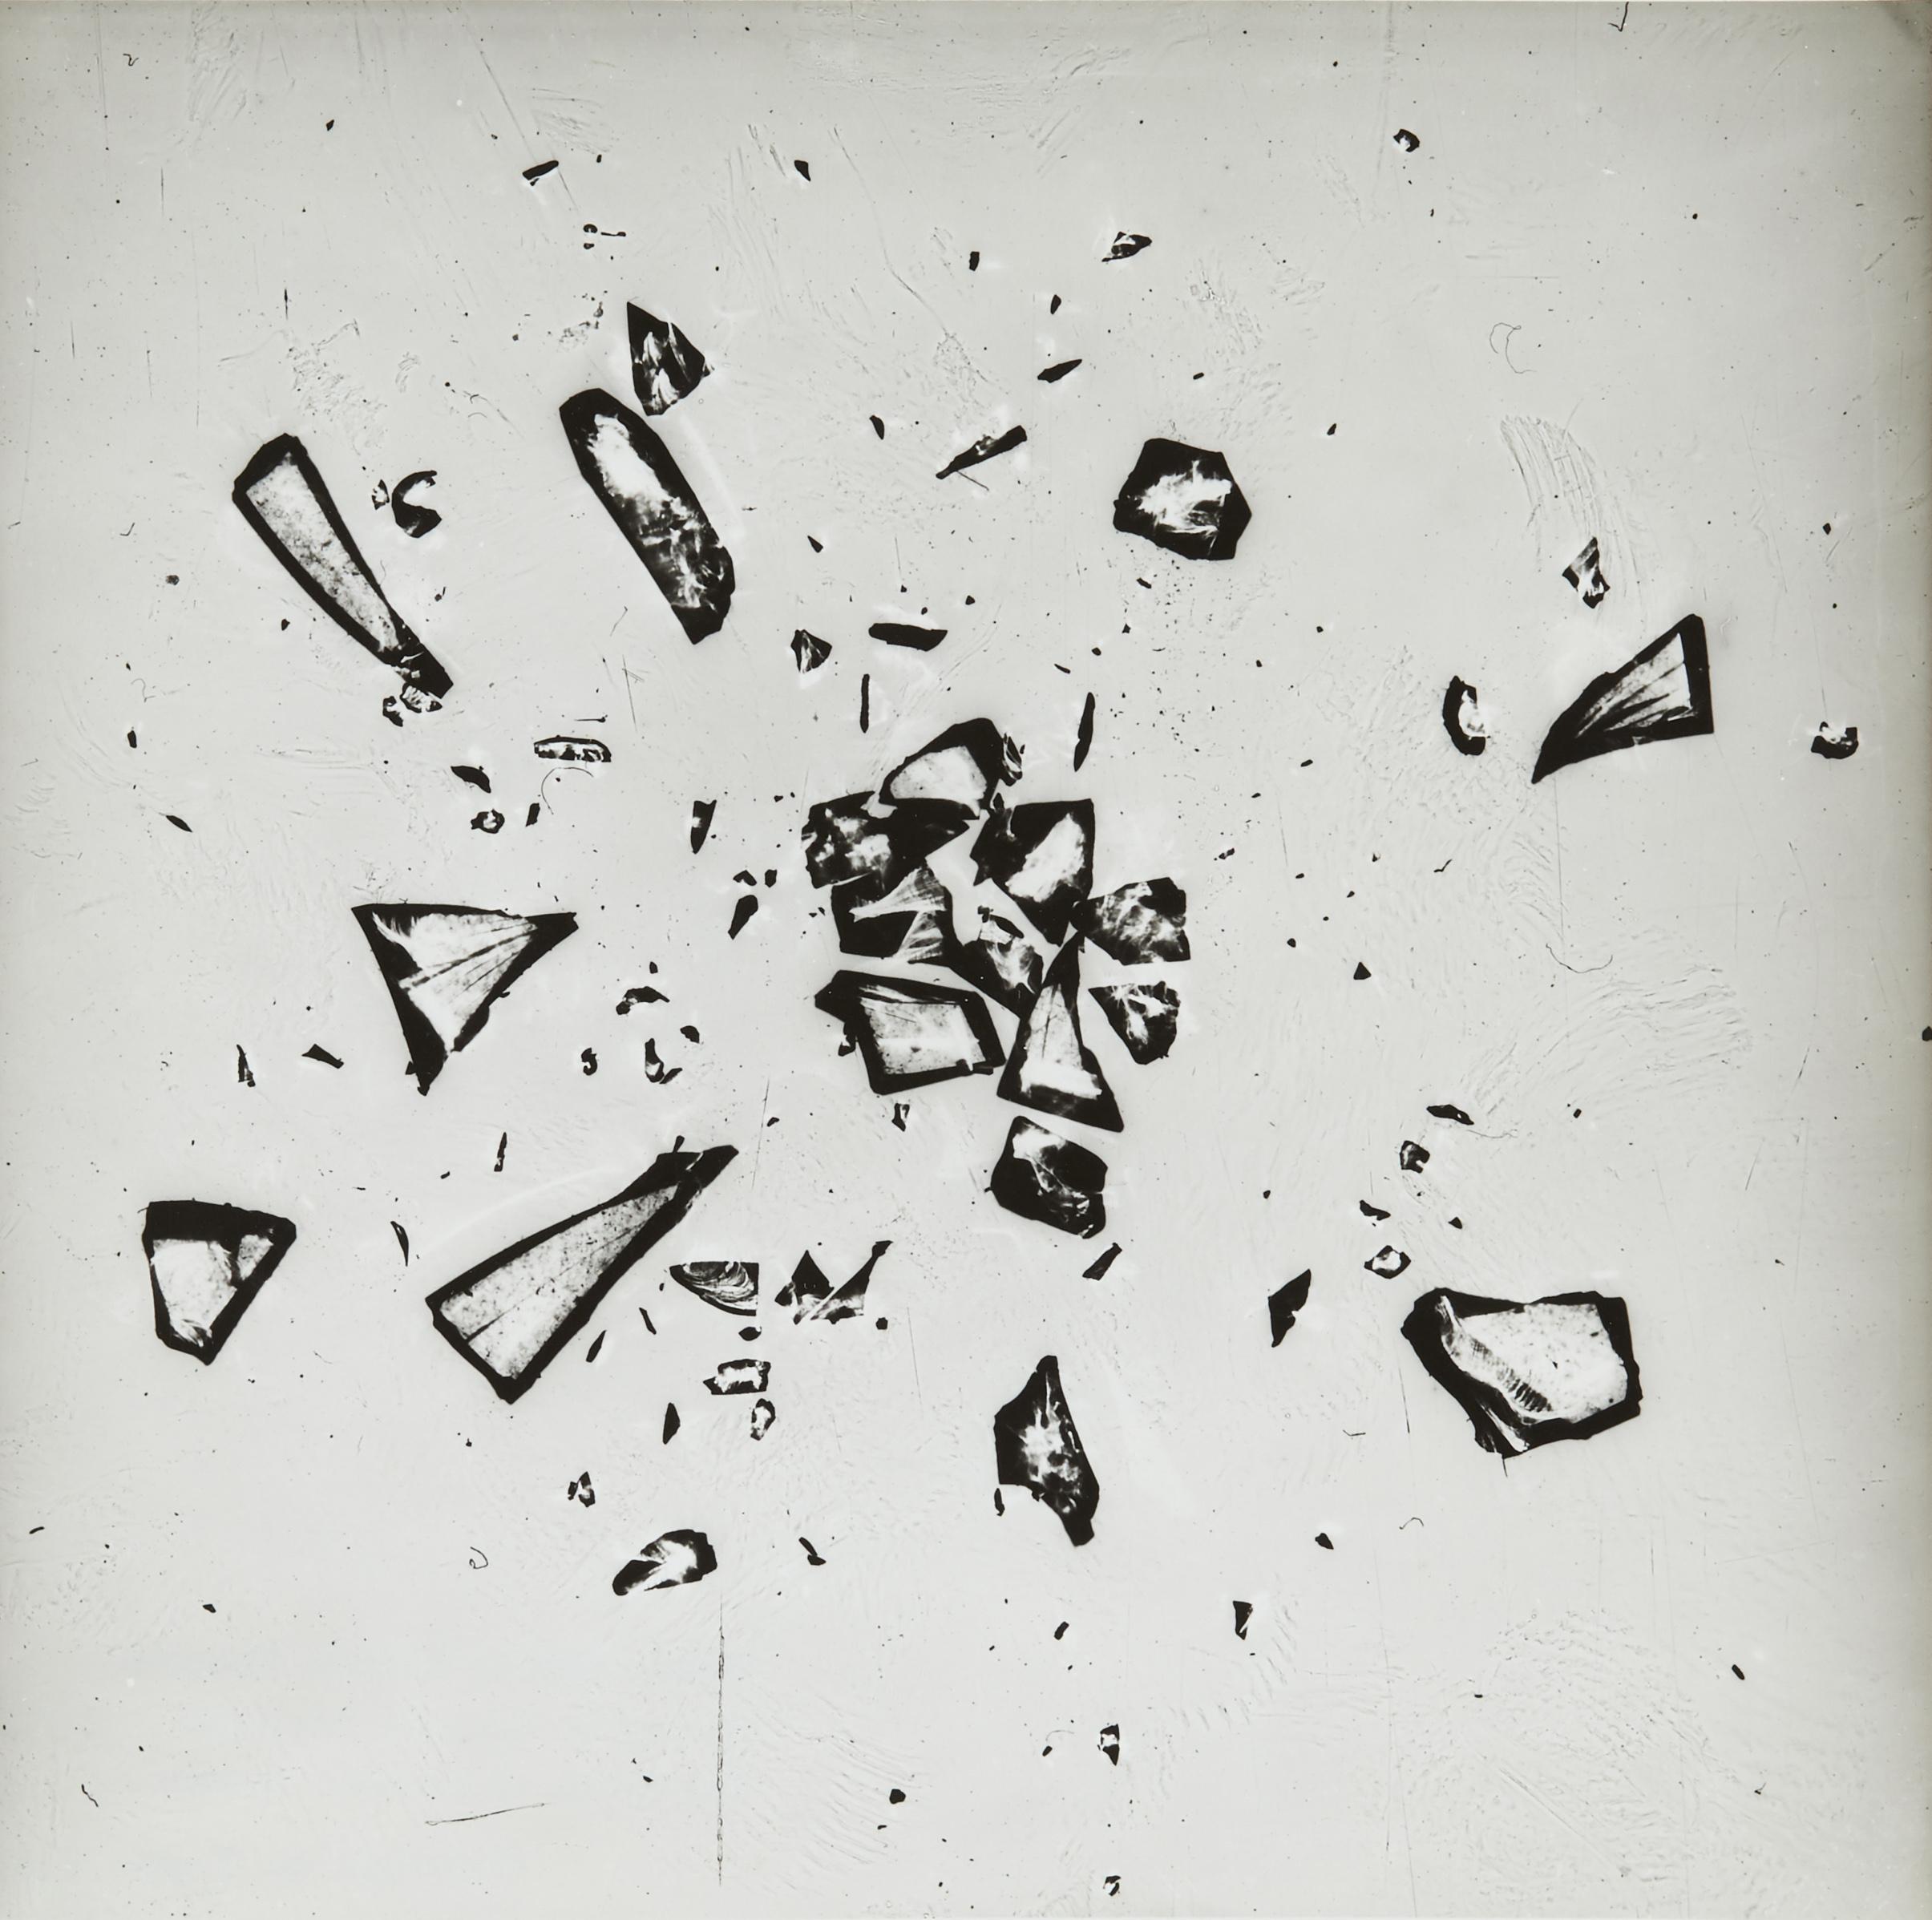 """Work"", 1959"